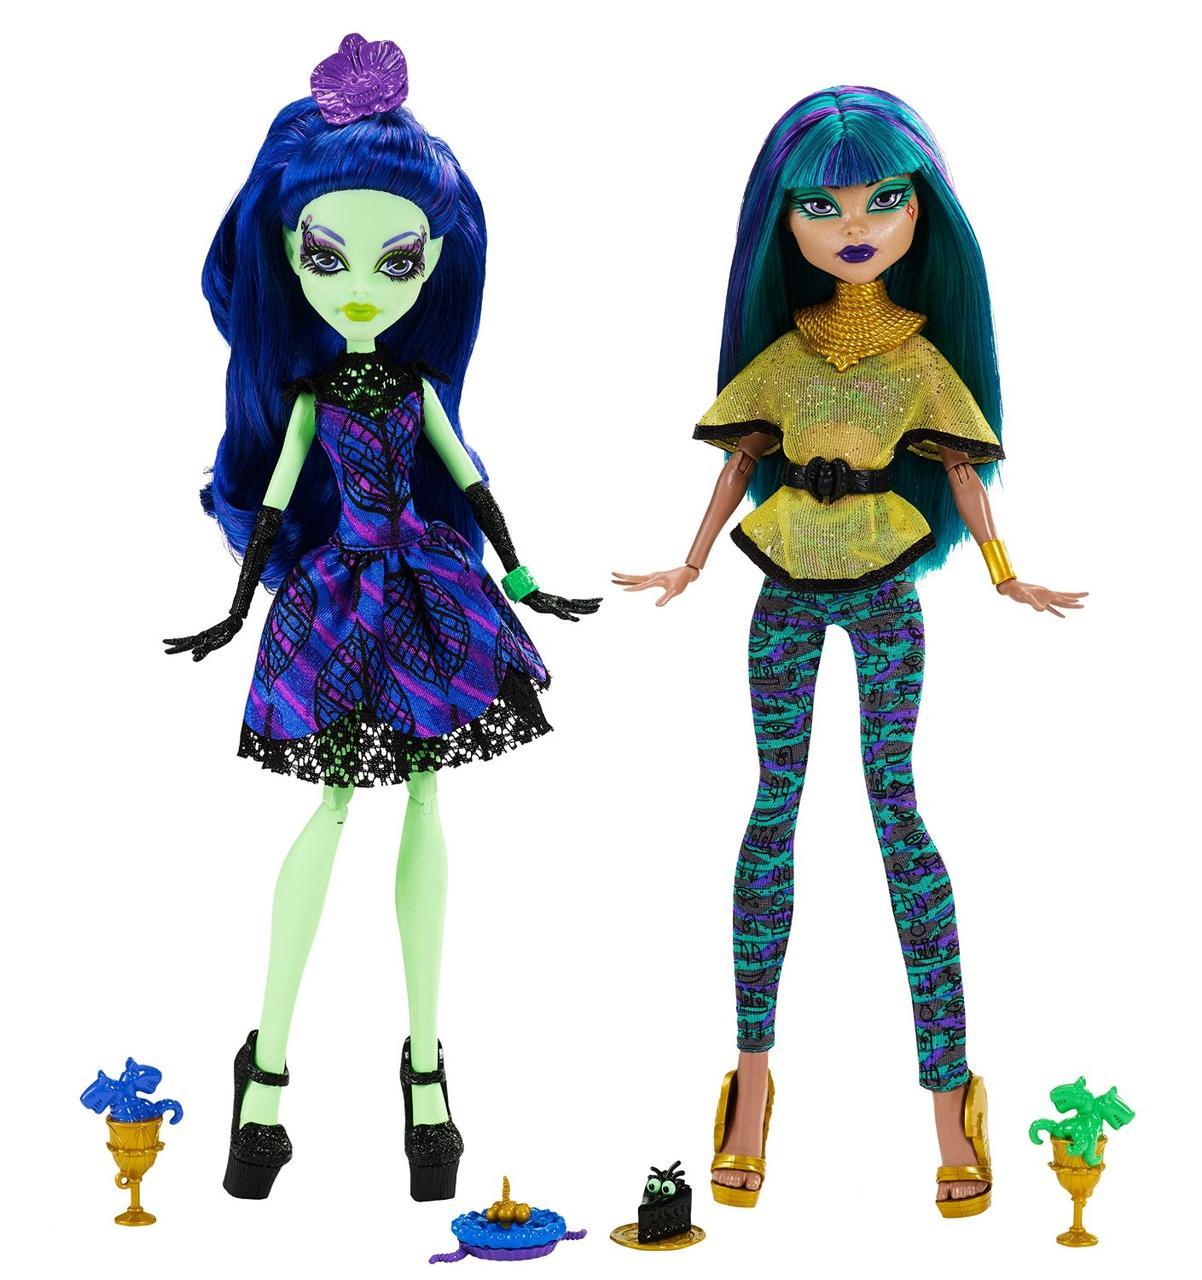 Monster High Нефера де Нил и Аманита Найтшейд Крик и сахар Amanita & Nefera Scream And Sugar 2 Pack DMD73